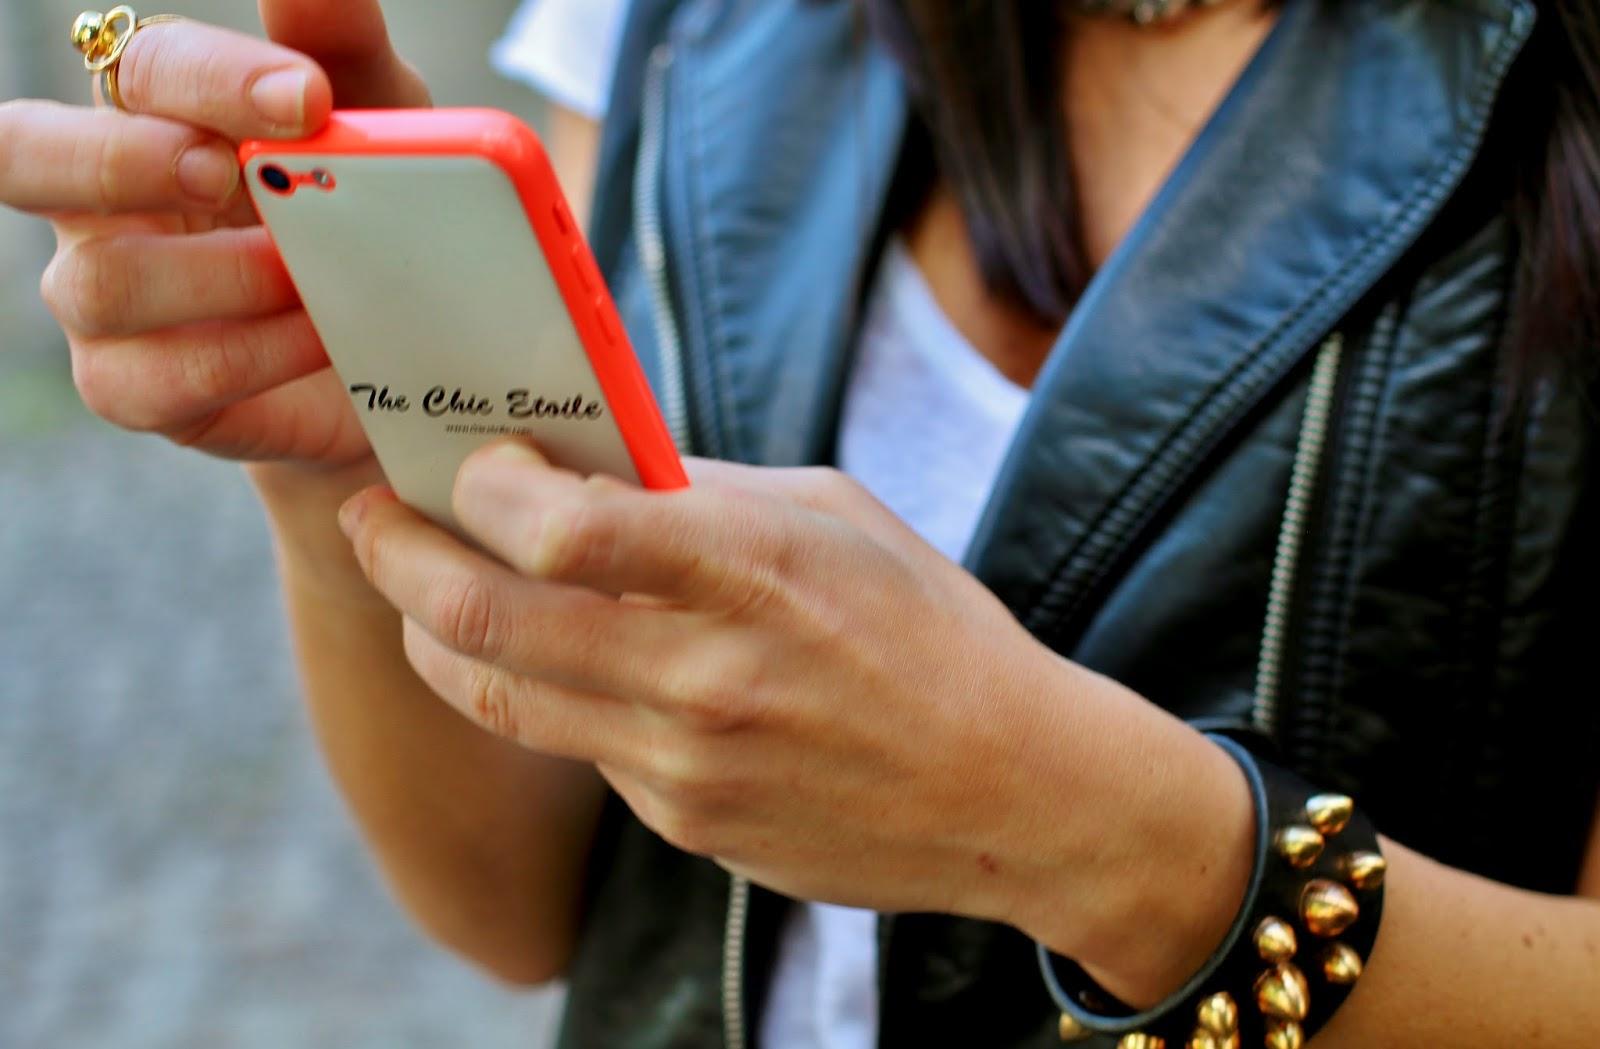 chic-etoile-iphone-case-customized-studs